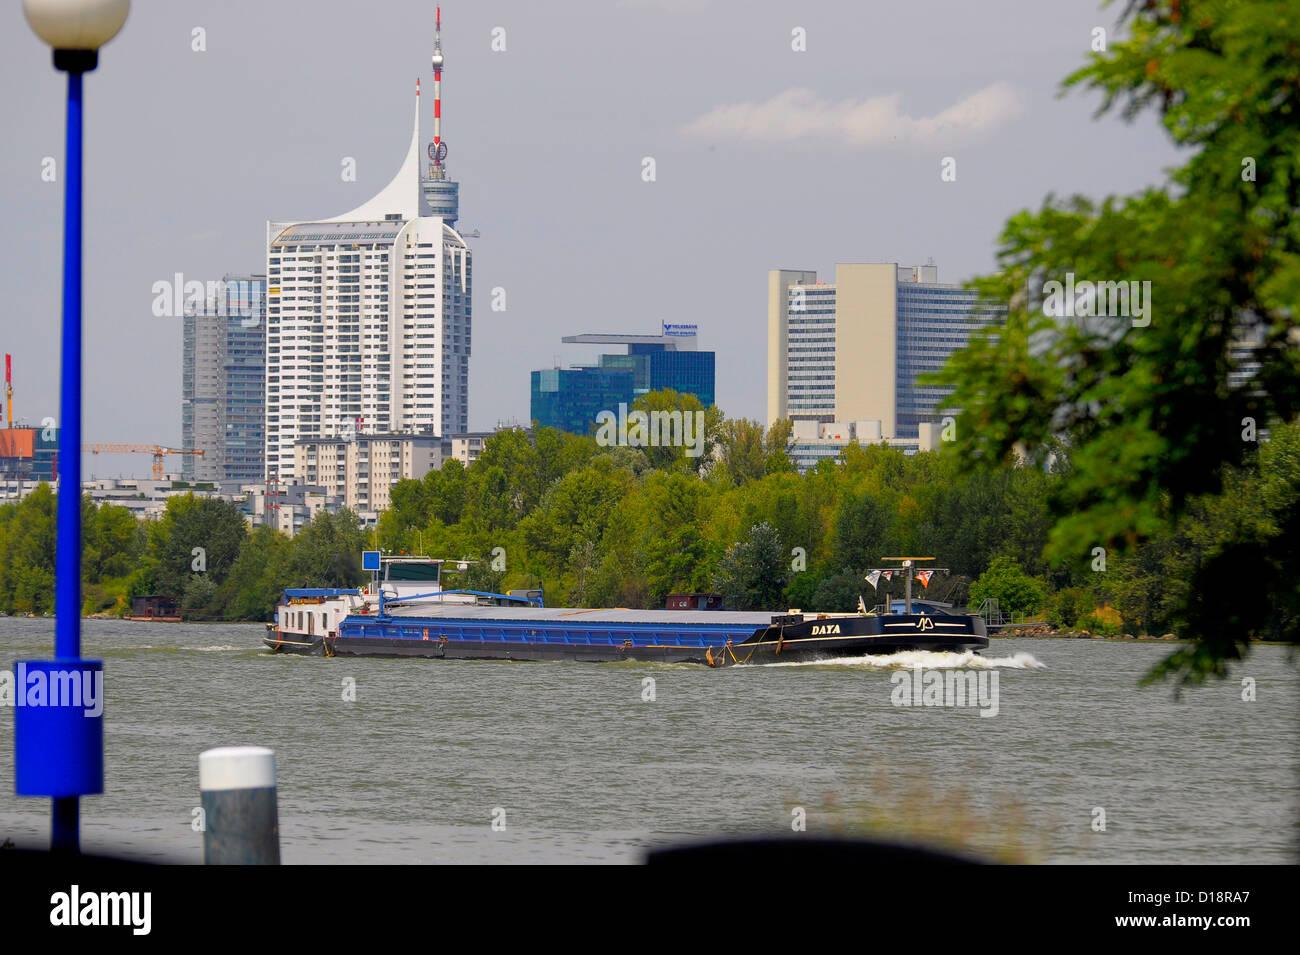 Österreich, Wien, Donaustrand, neues,modernes Wien, Donau City, Fernsehturm, - Stock Image